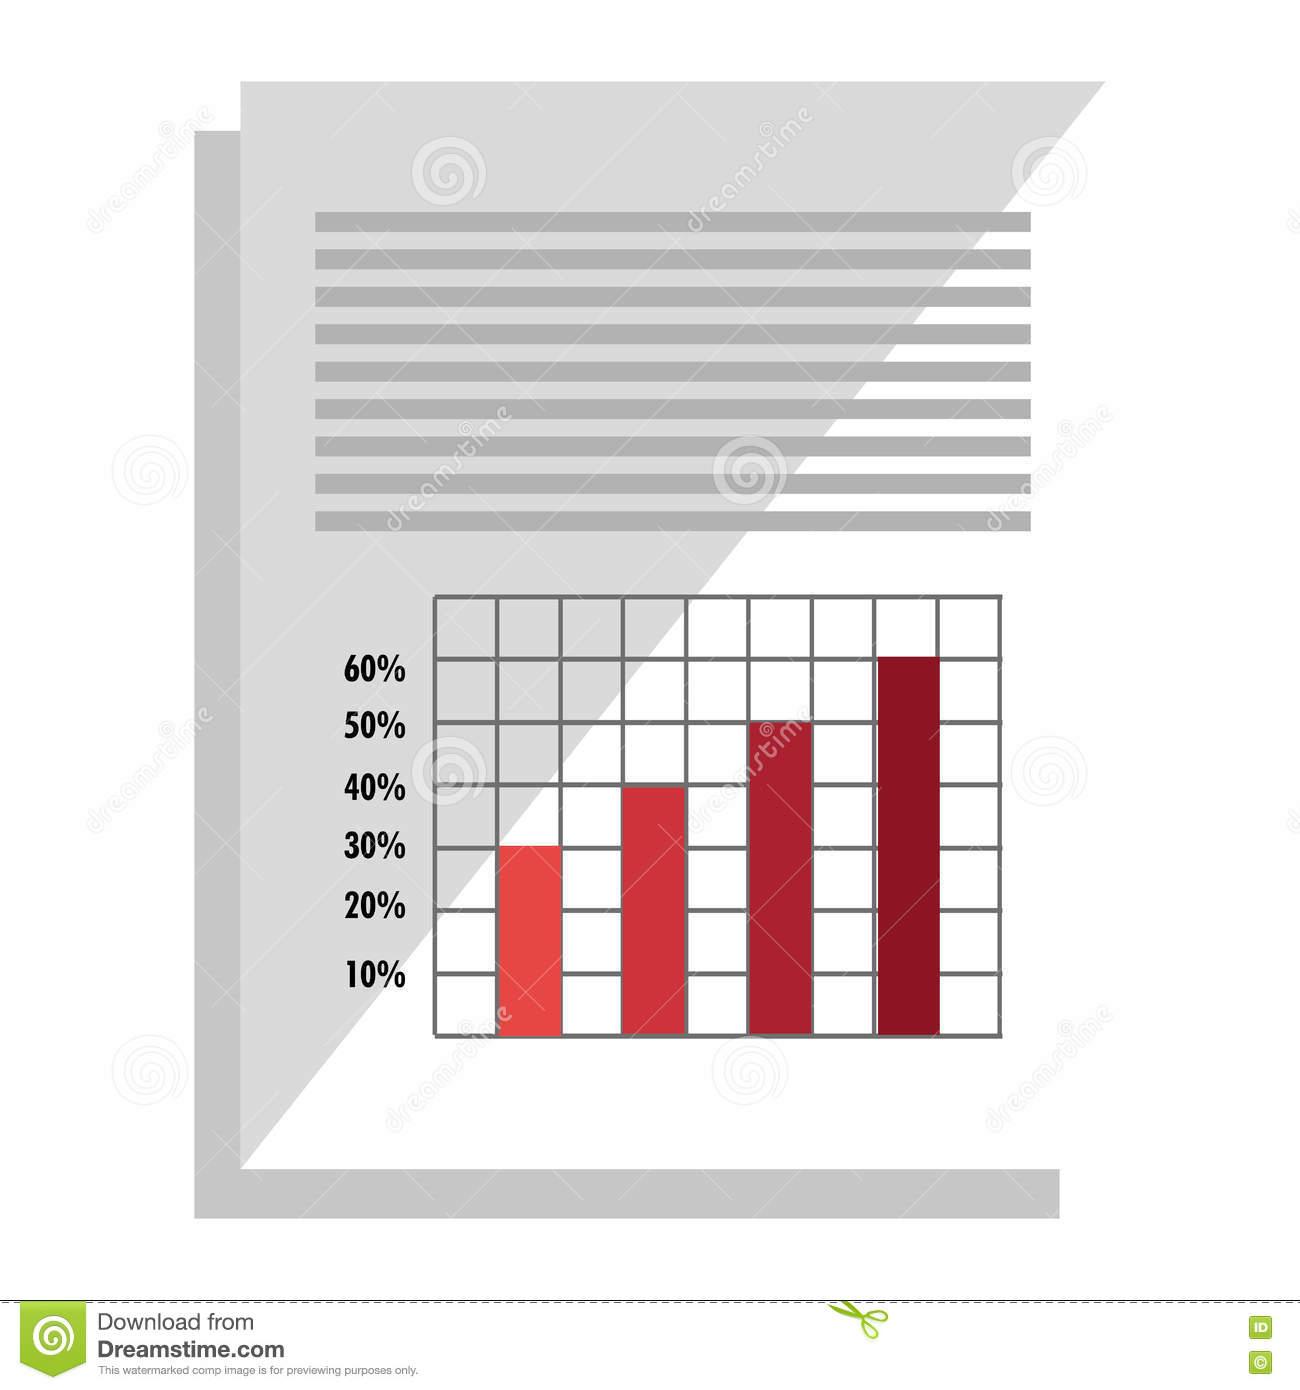 Spreadsheet Graphics Inside Spreadsheet With Statistics Graphics Icon. Stock Vector